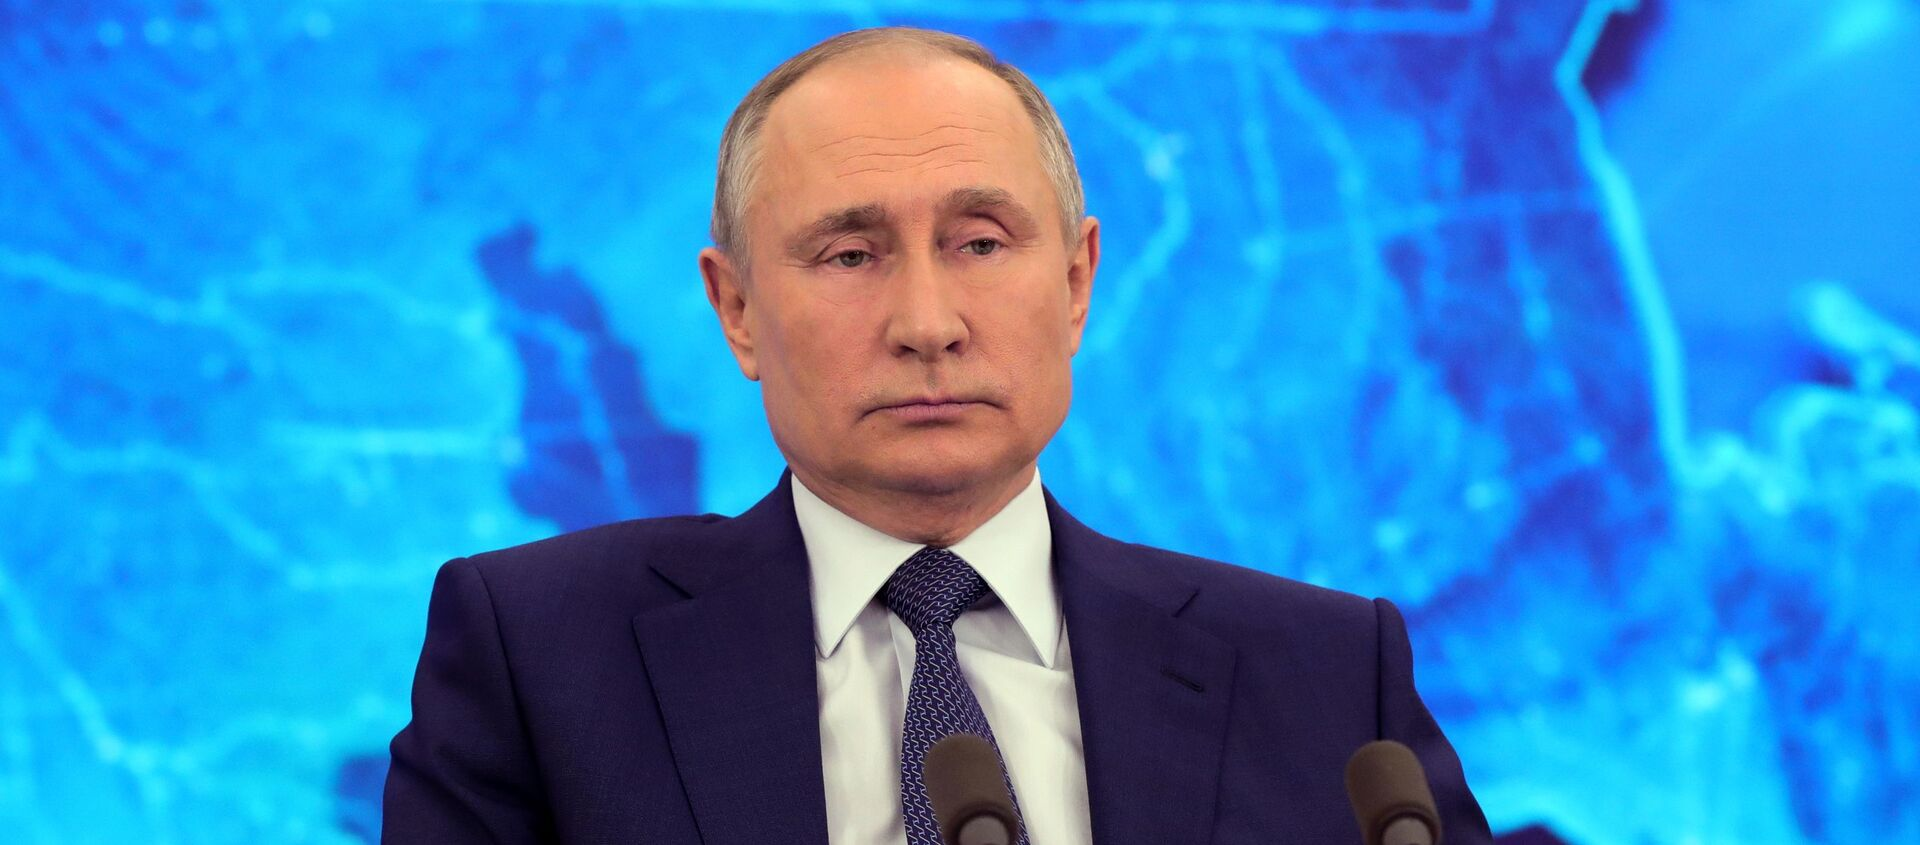 Владимир Путин - Sputnik Грузия, 1920, 12.02.2021